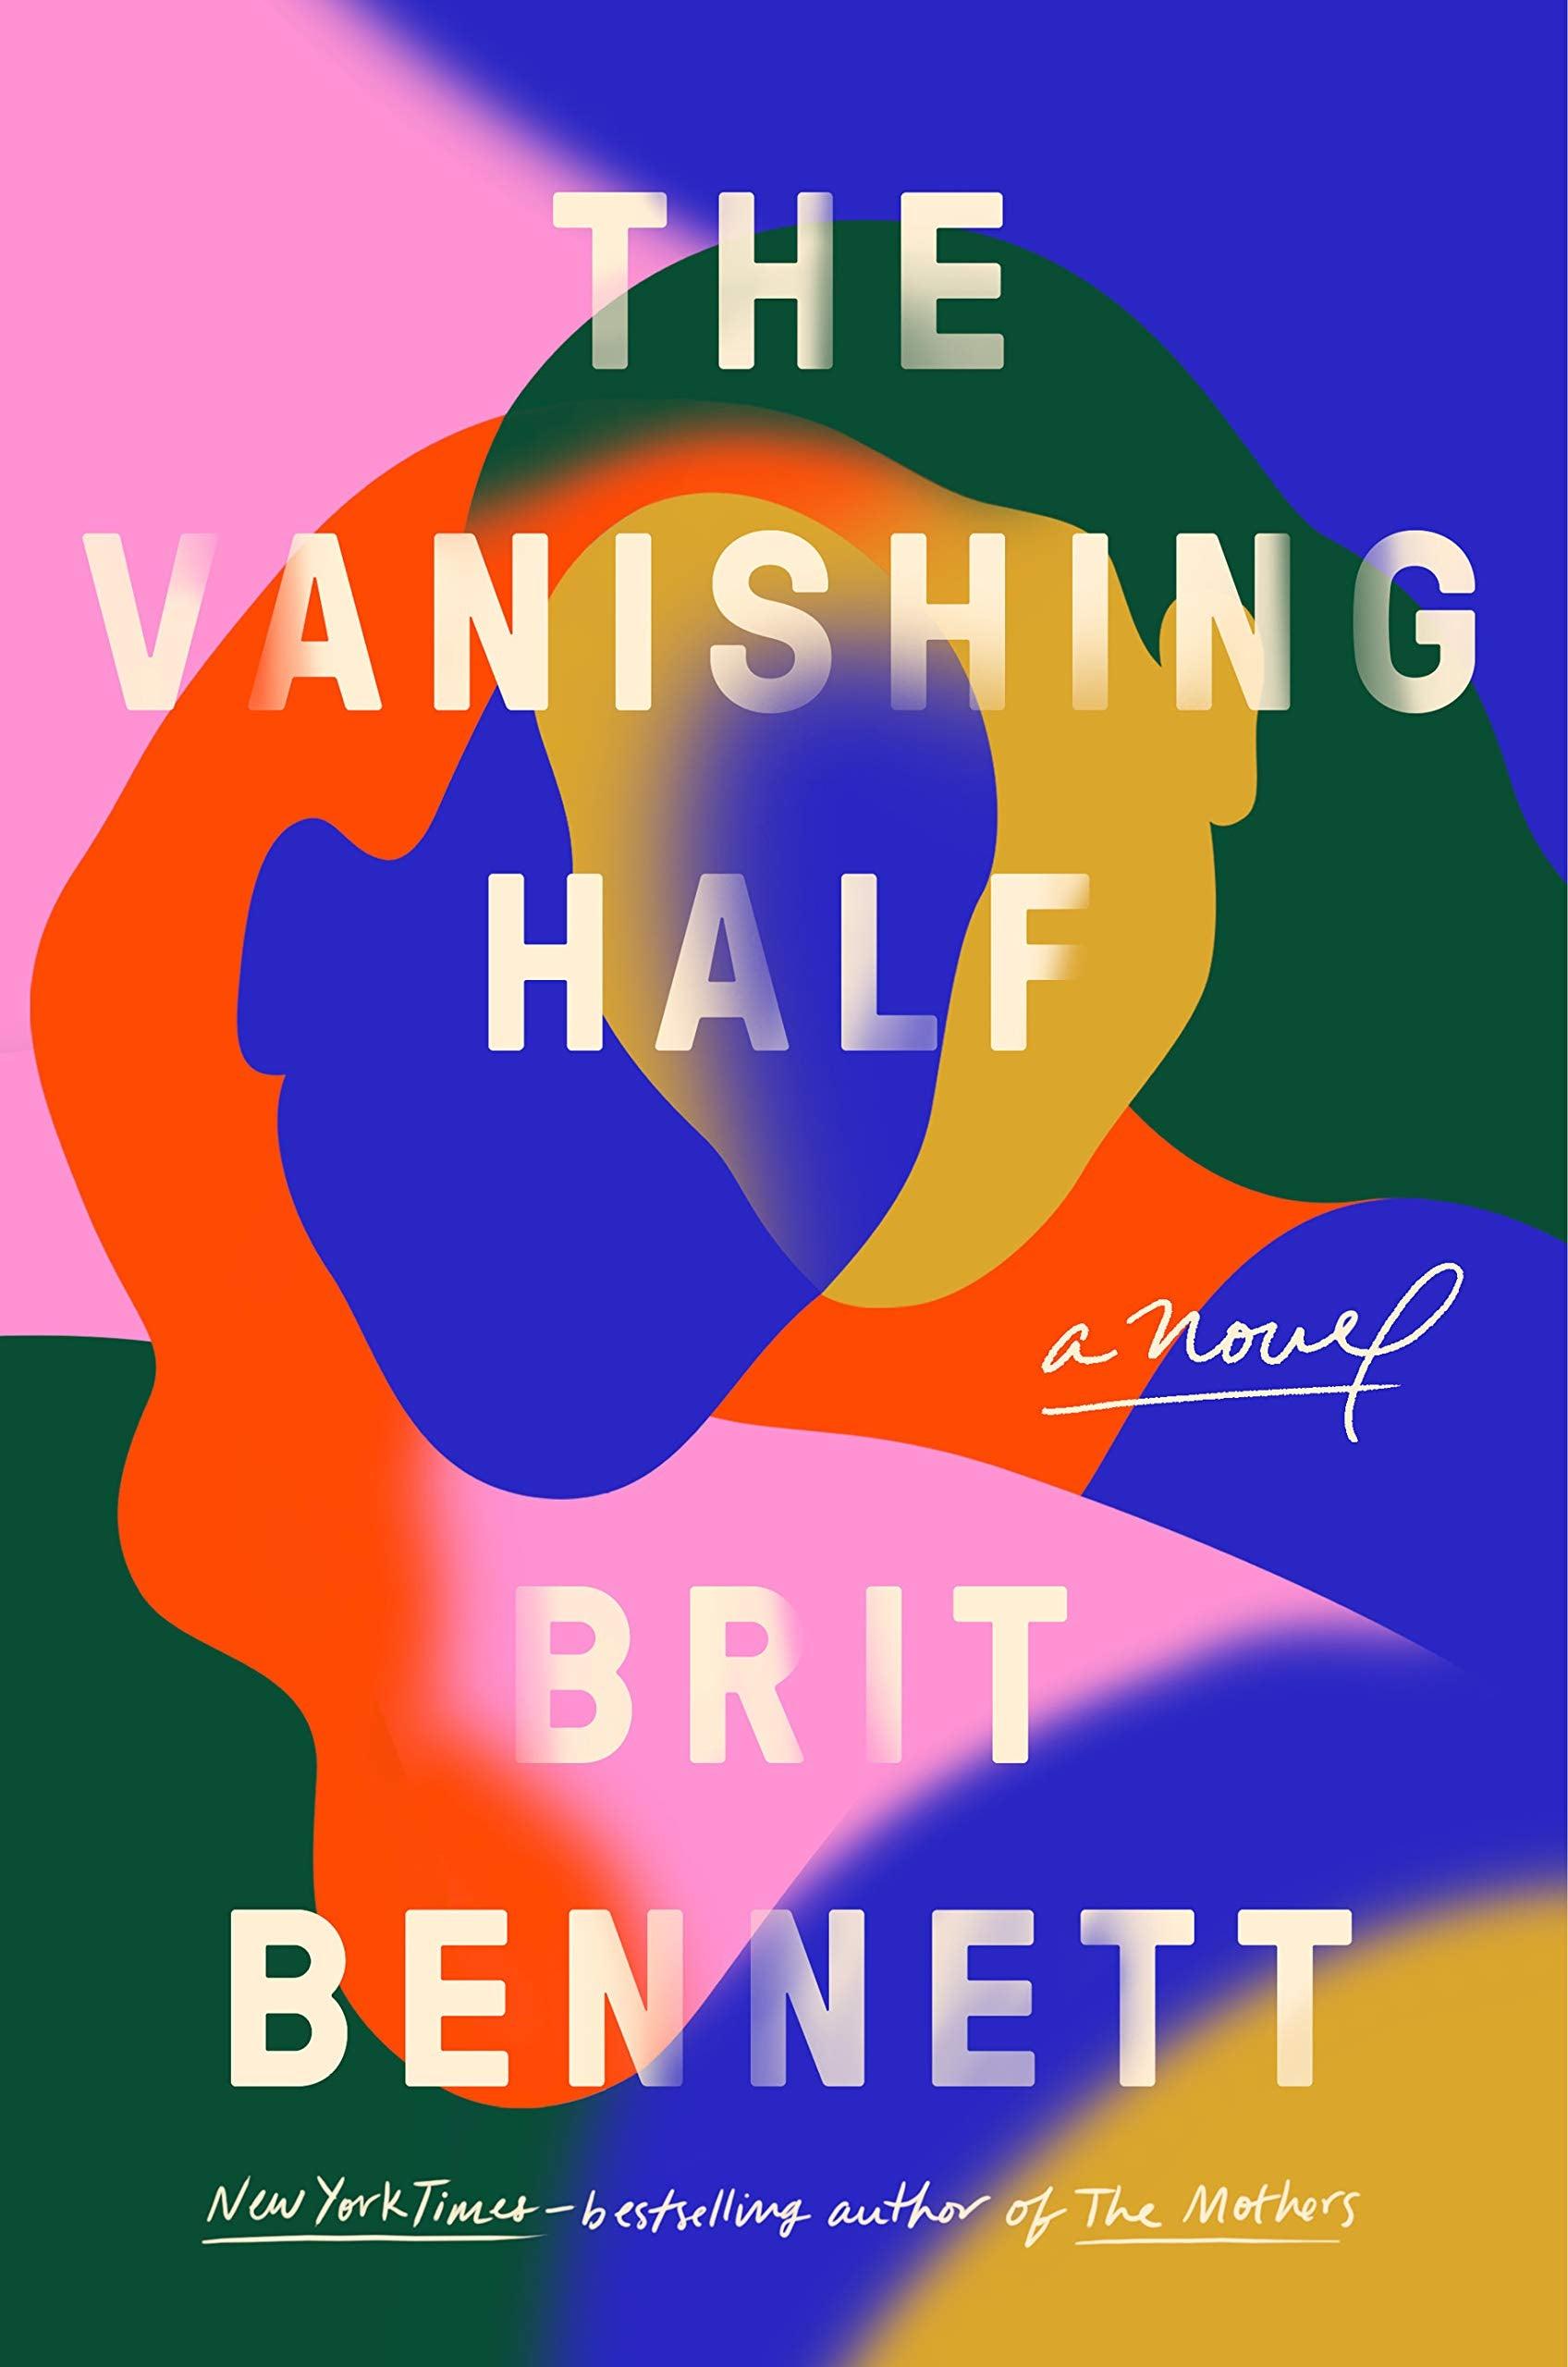 The Vanishing Half- A Novel cover